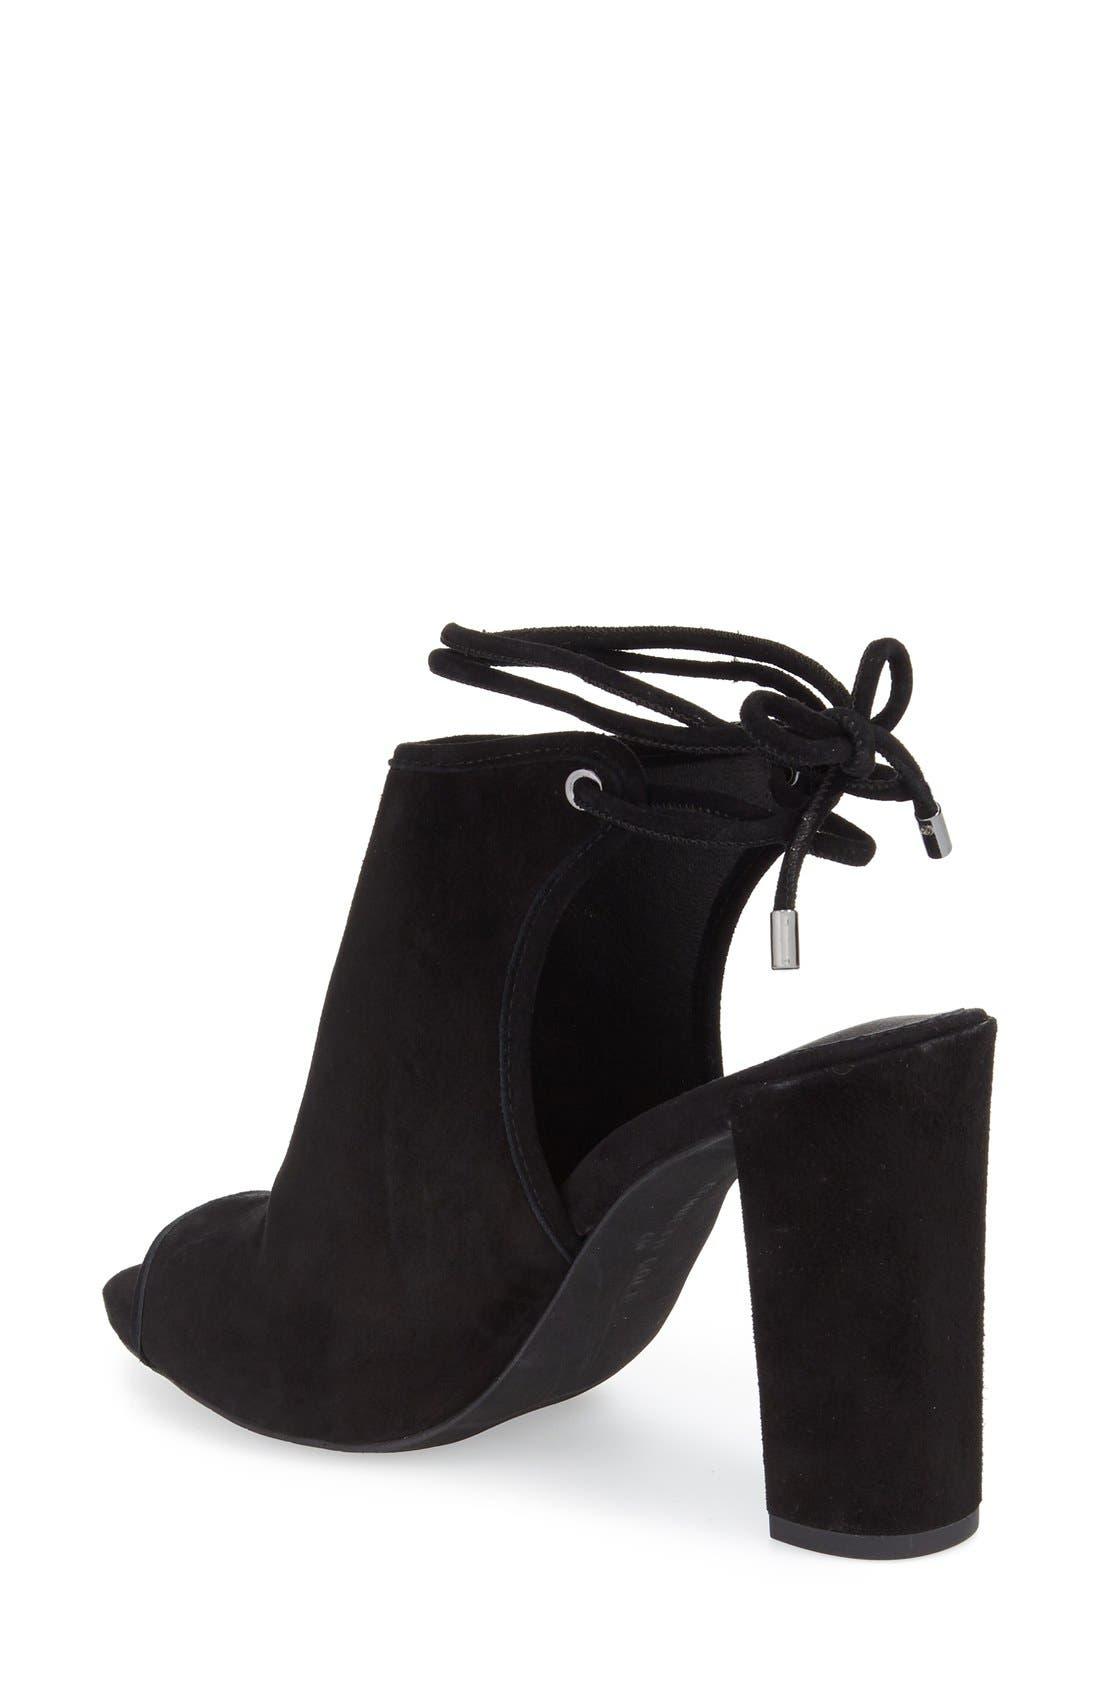 Alternate Image 2  - Kenneth Cole New York Darla Block Heel Sandal (Women)